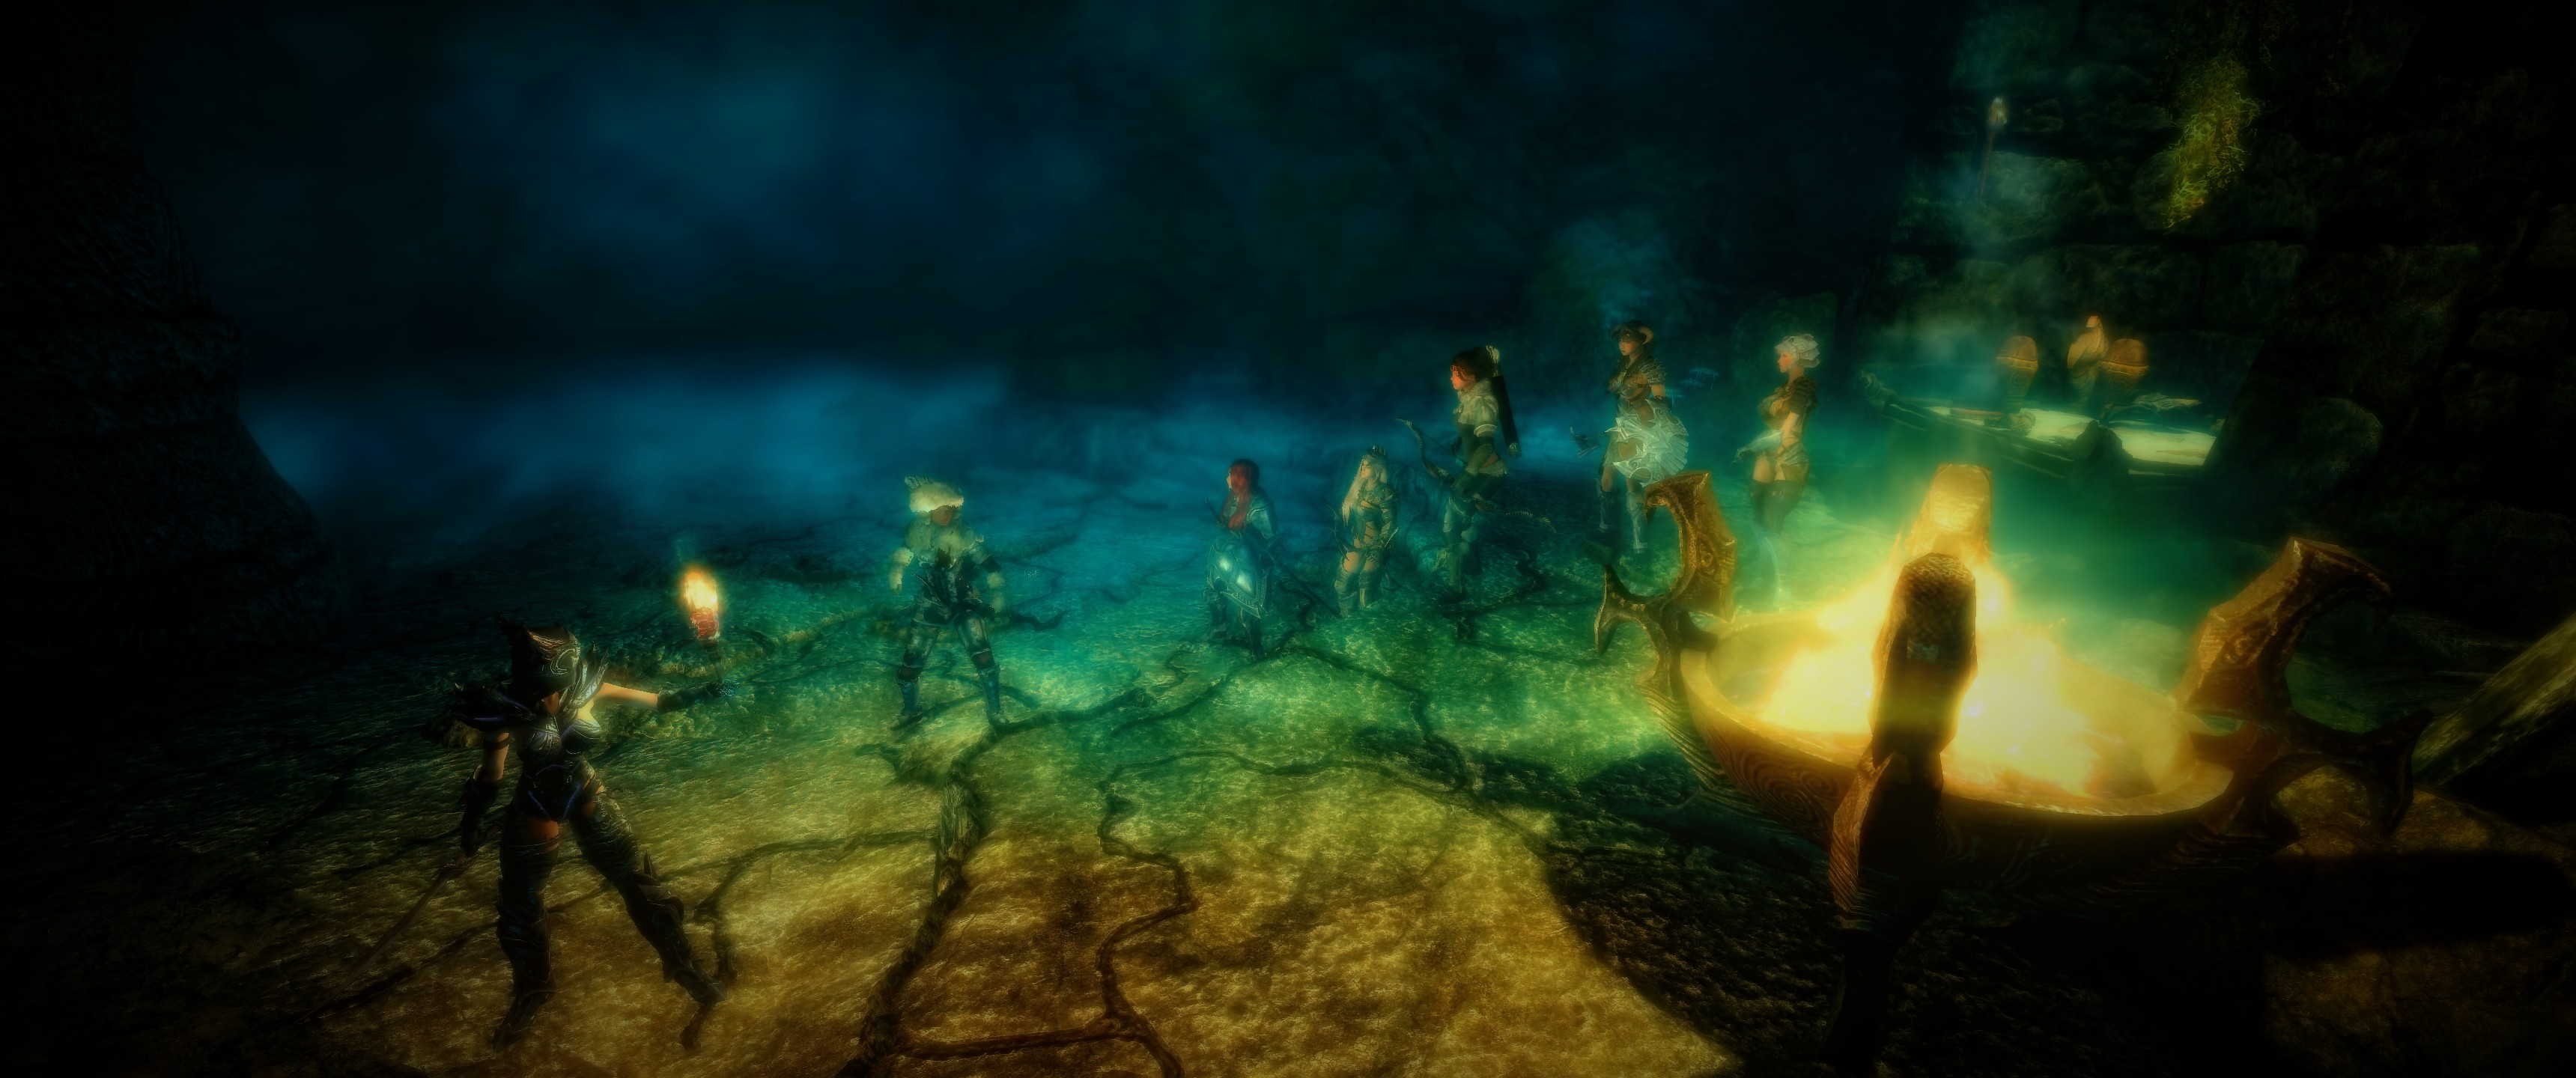 20171218182233_1.jpg - Elder Scrolls 5: Skyrim, the